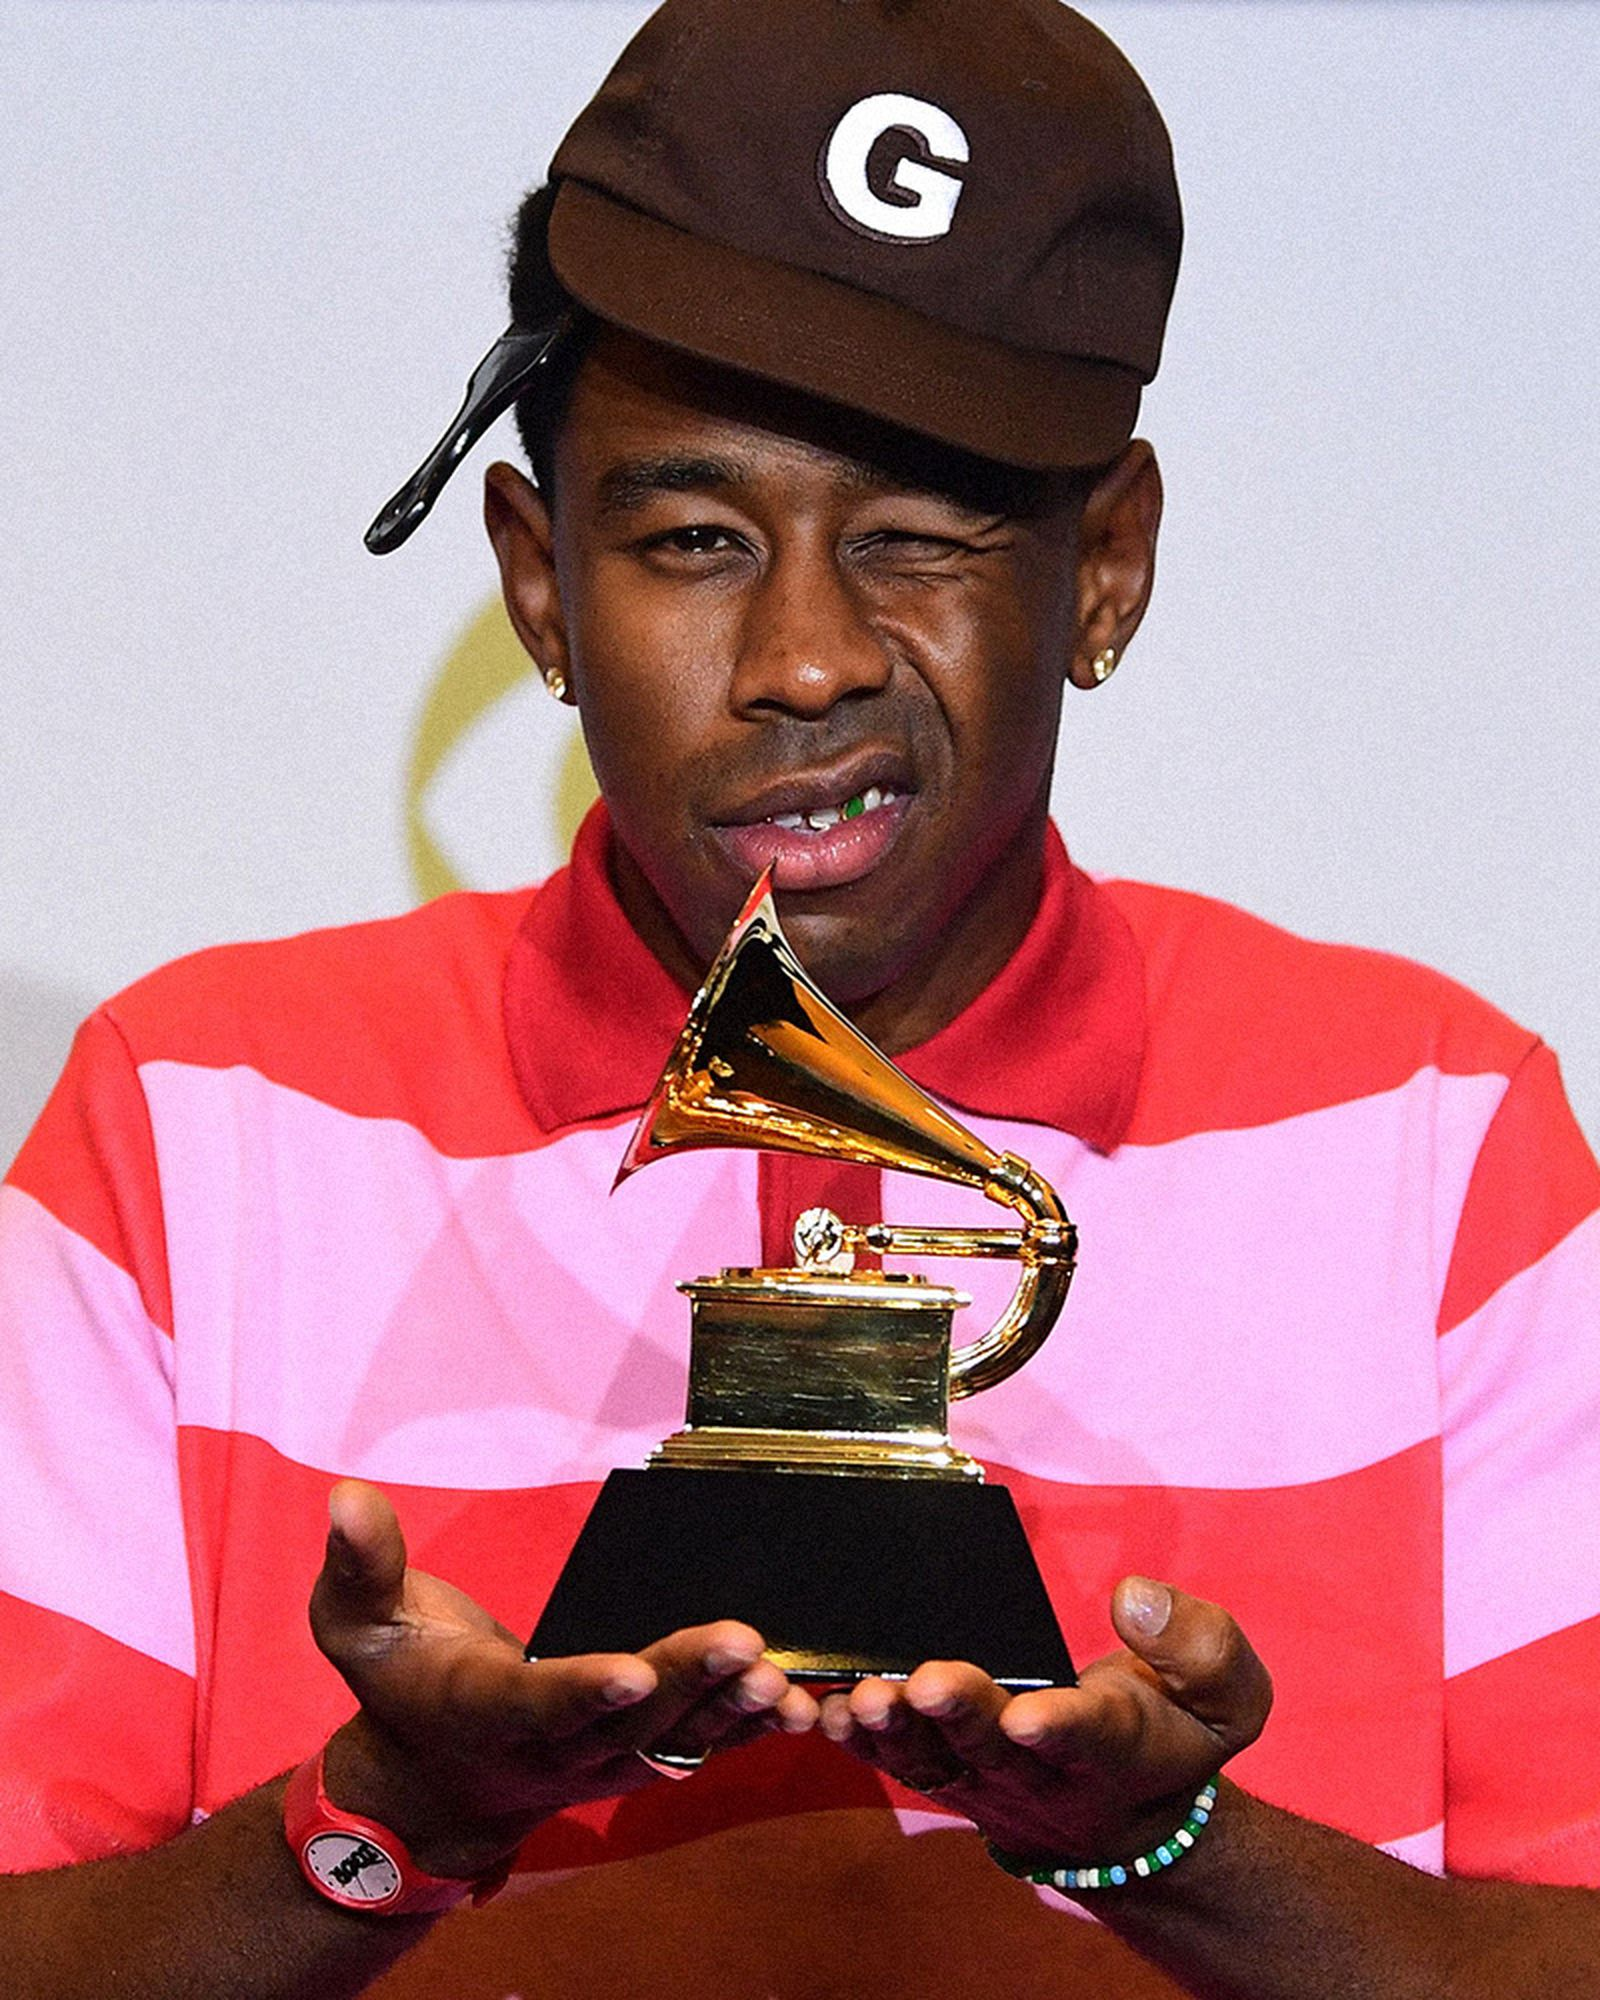 grammy-nominations-2021-black-music-snubs-02